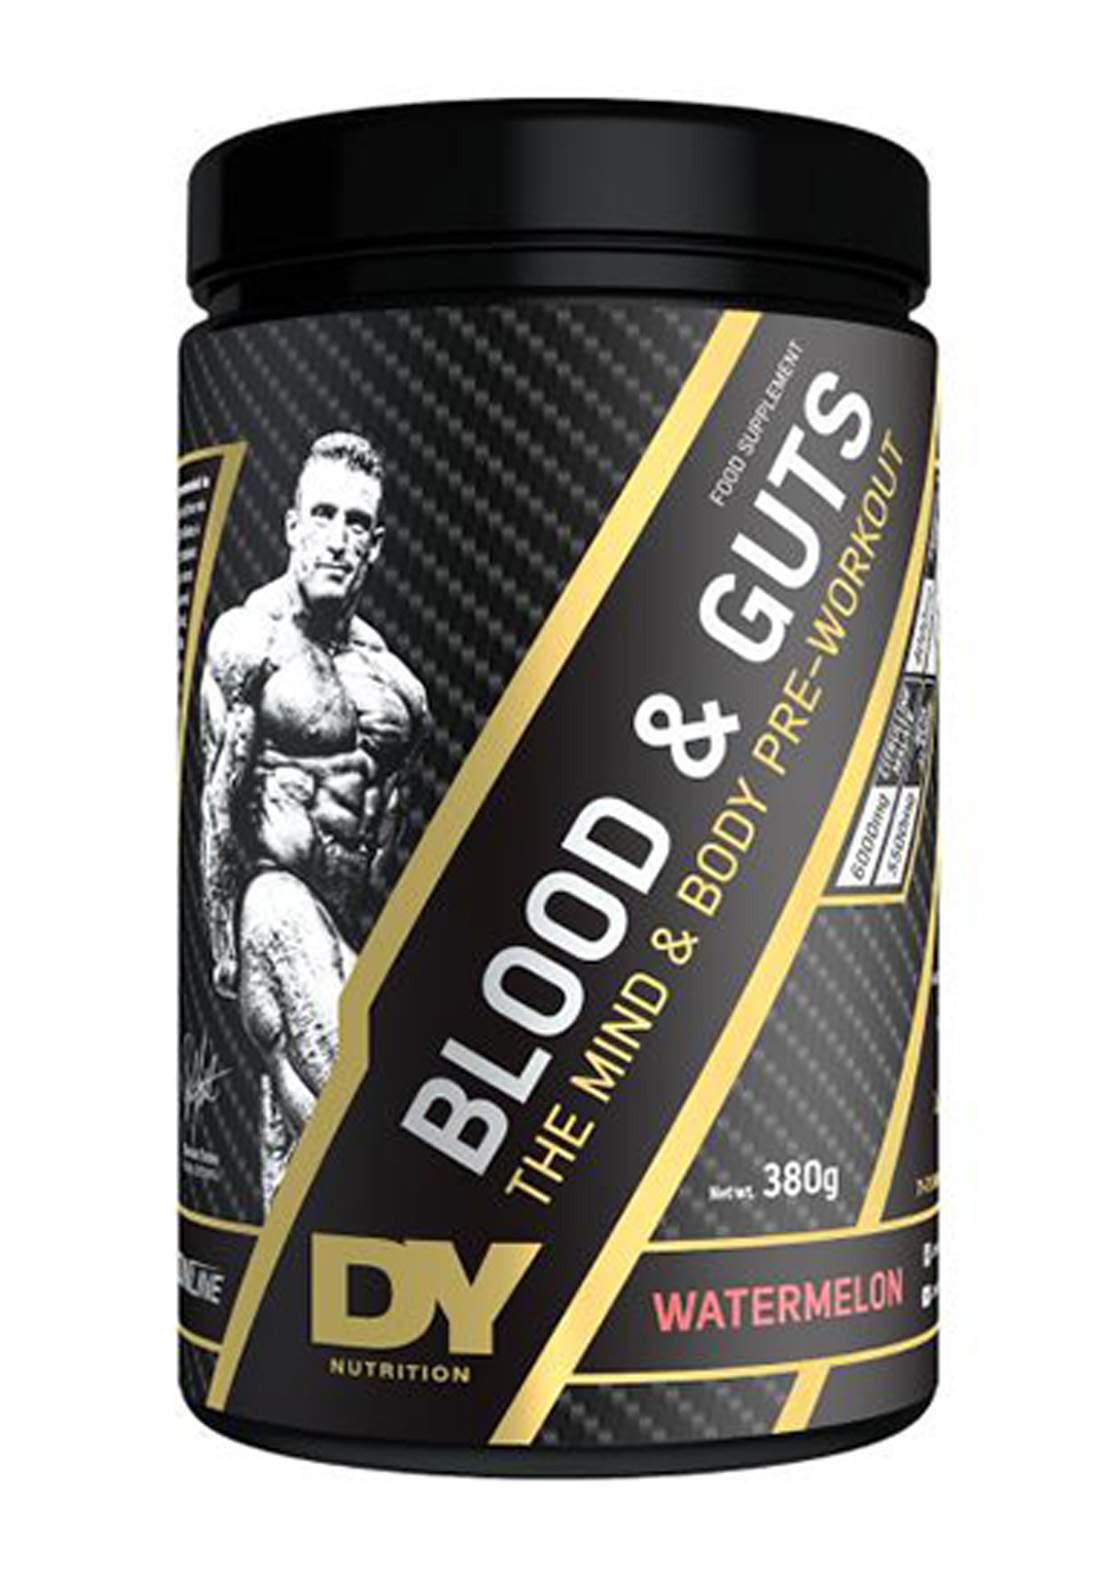 Dy Nutrition Blood And Guts Watermelon  Flavor 380g مكمل غذائي بنكهة البطيخ الأحمر